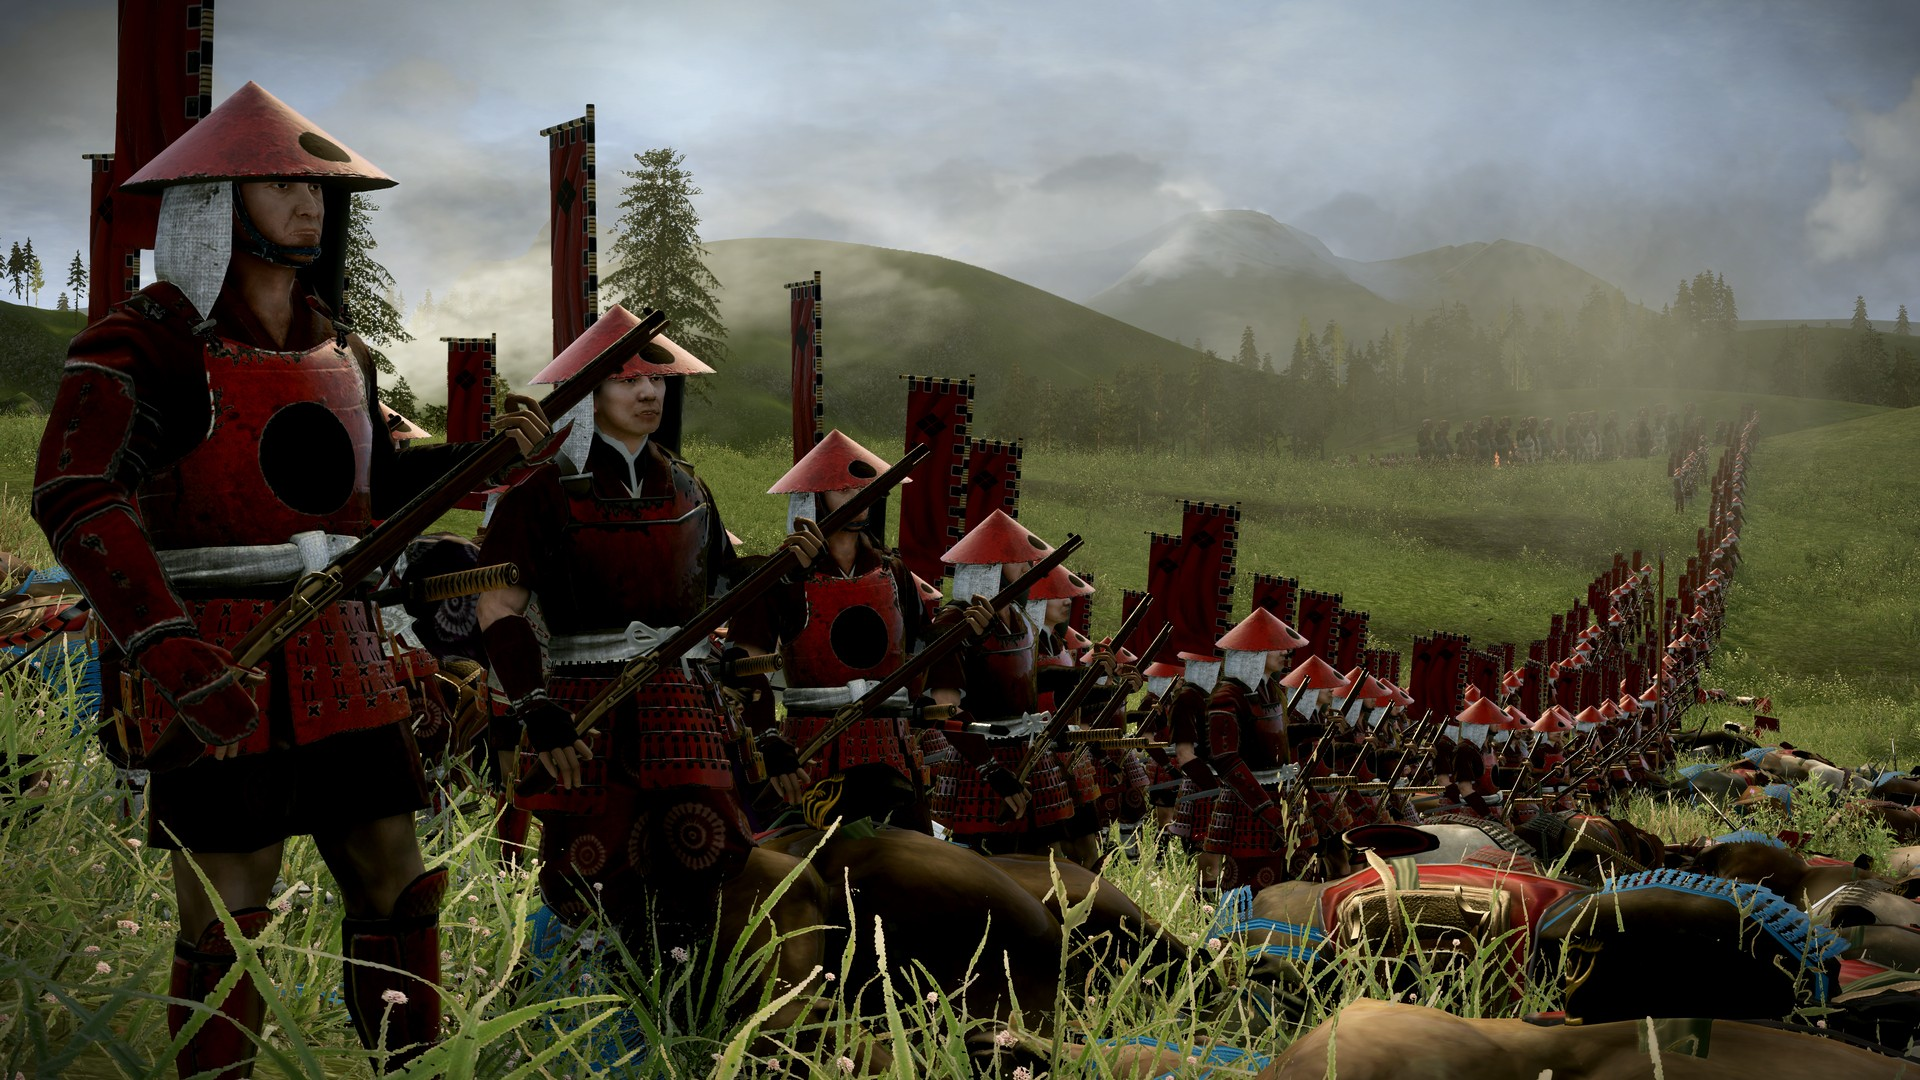 total war: shogun 2 hd wallpaper | background image | 1920x1080 | id